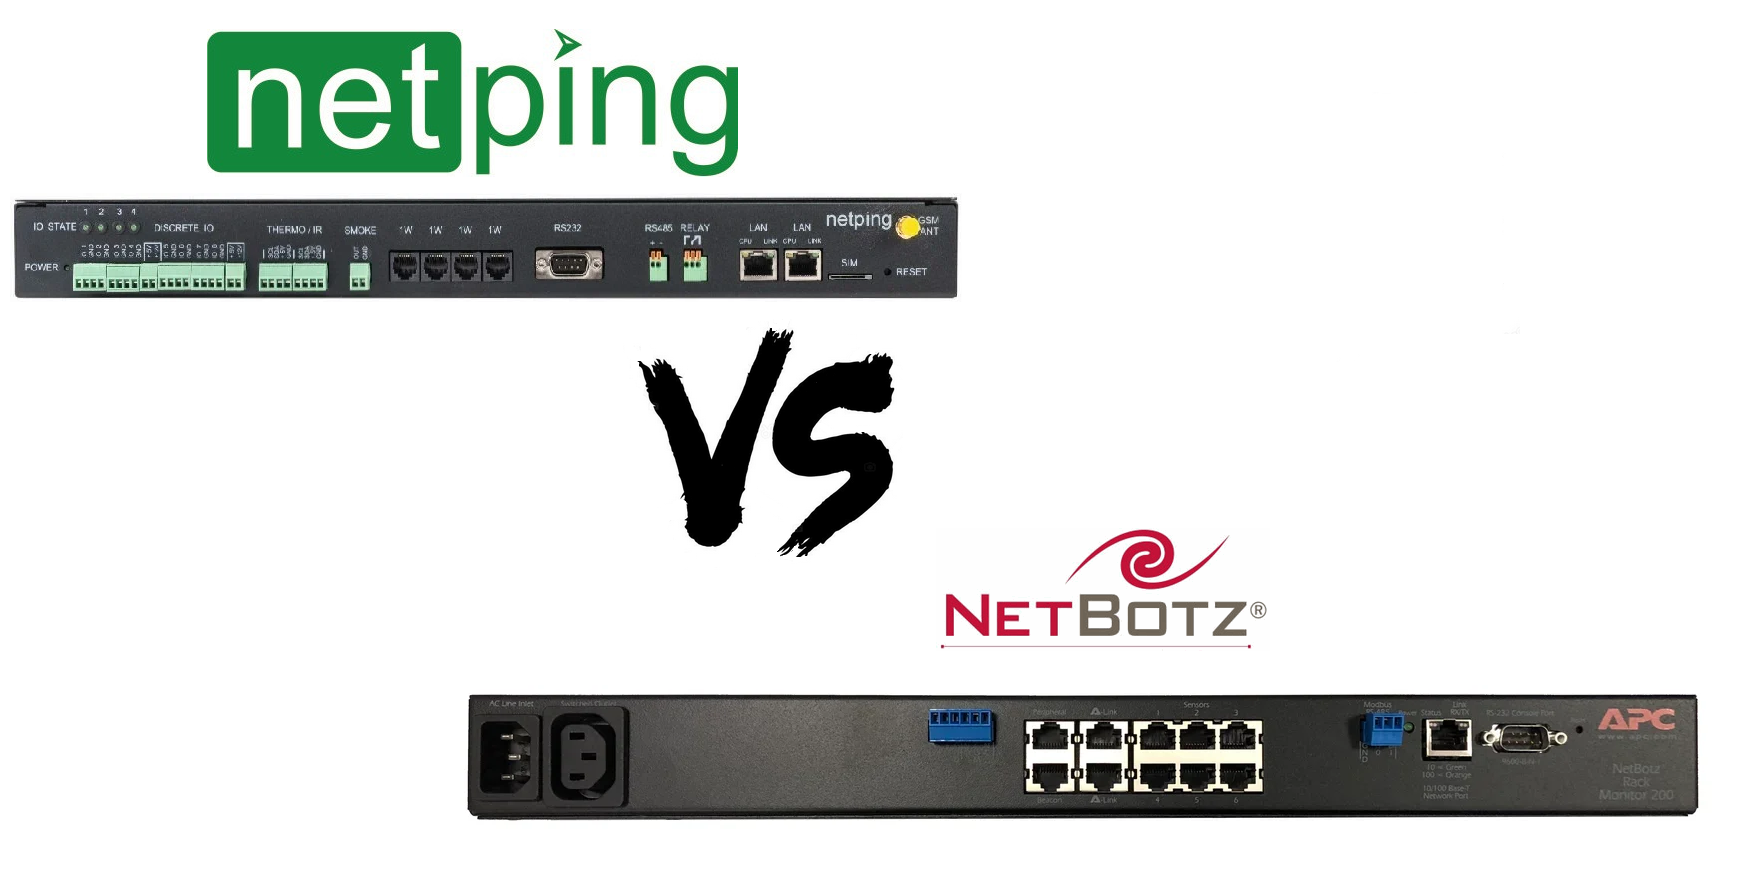 NetPing vs NetBotz